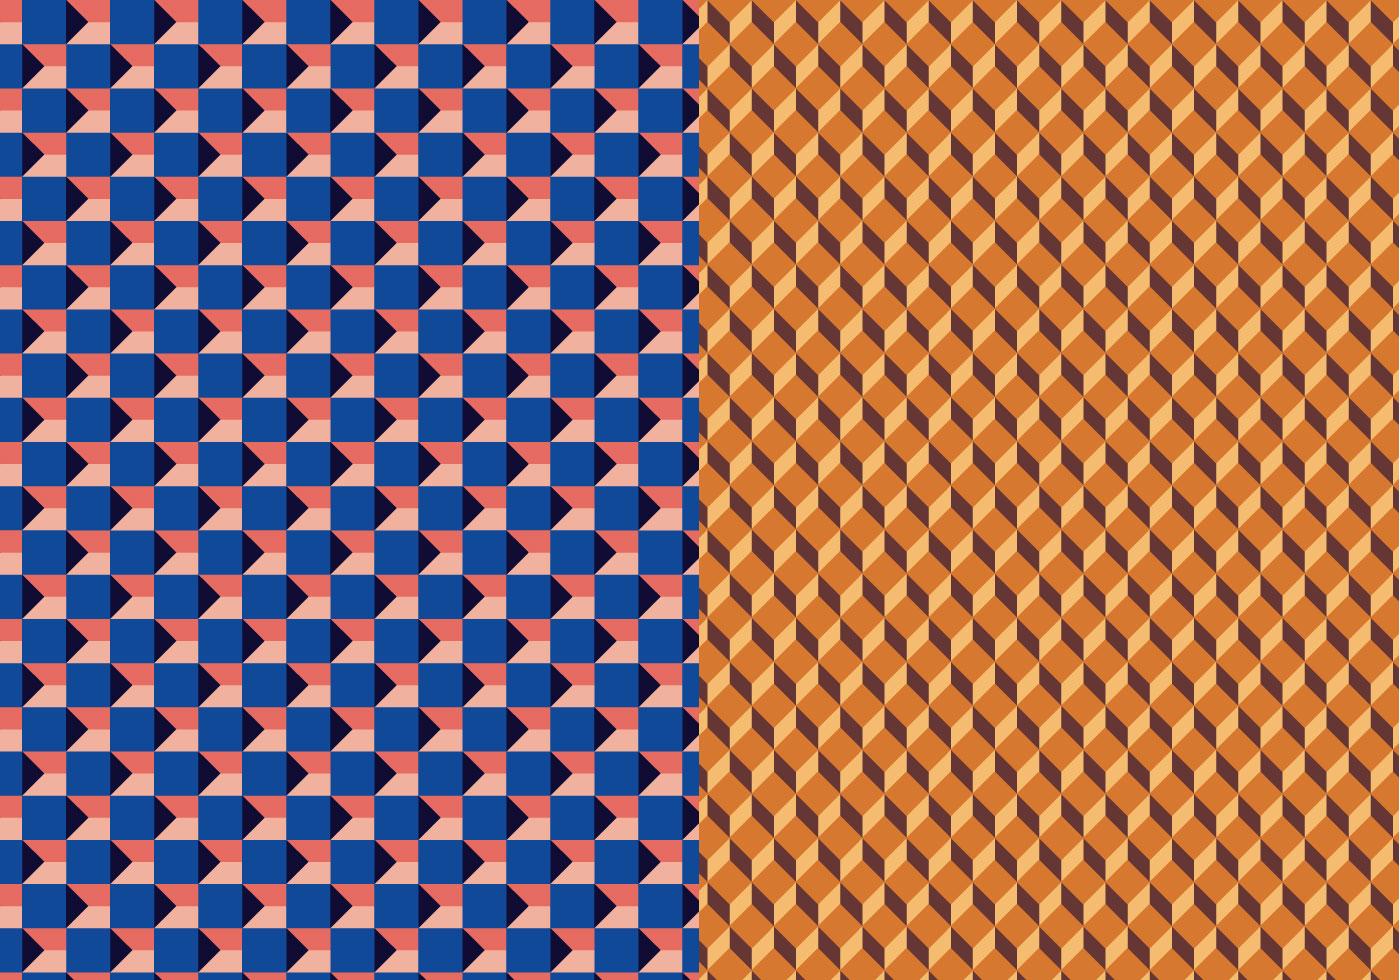 geometric 3d vector pattern download free vector art